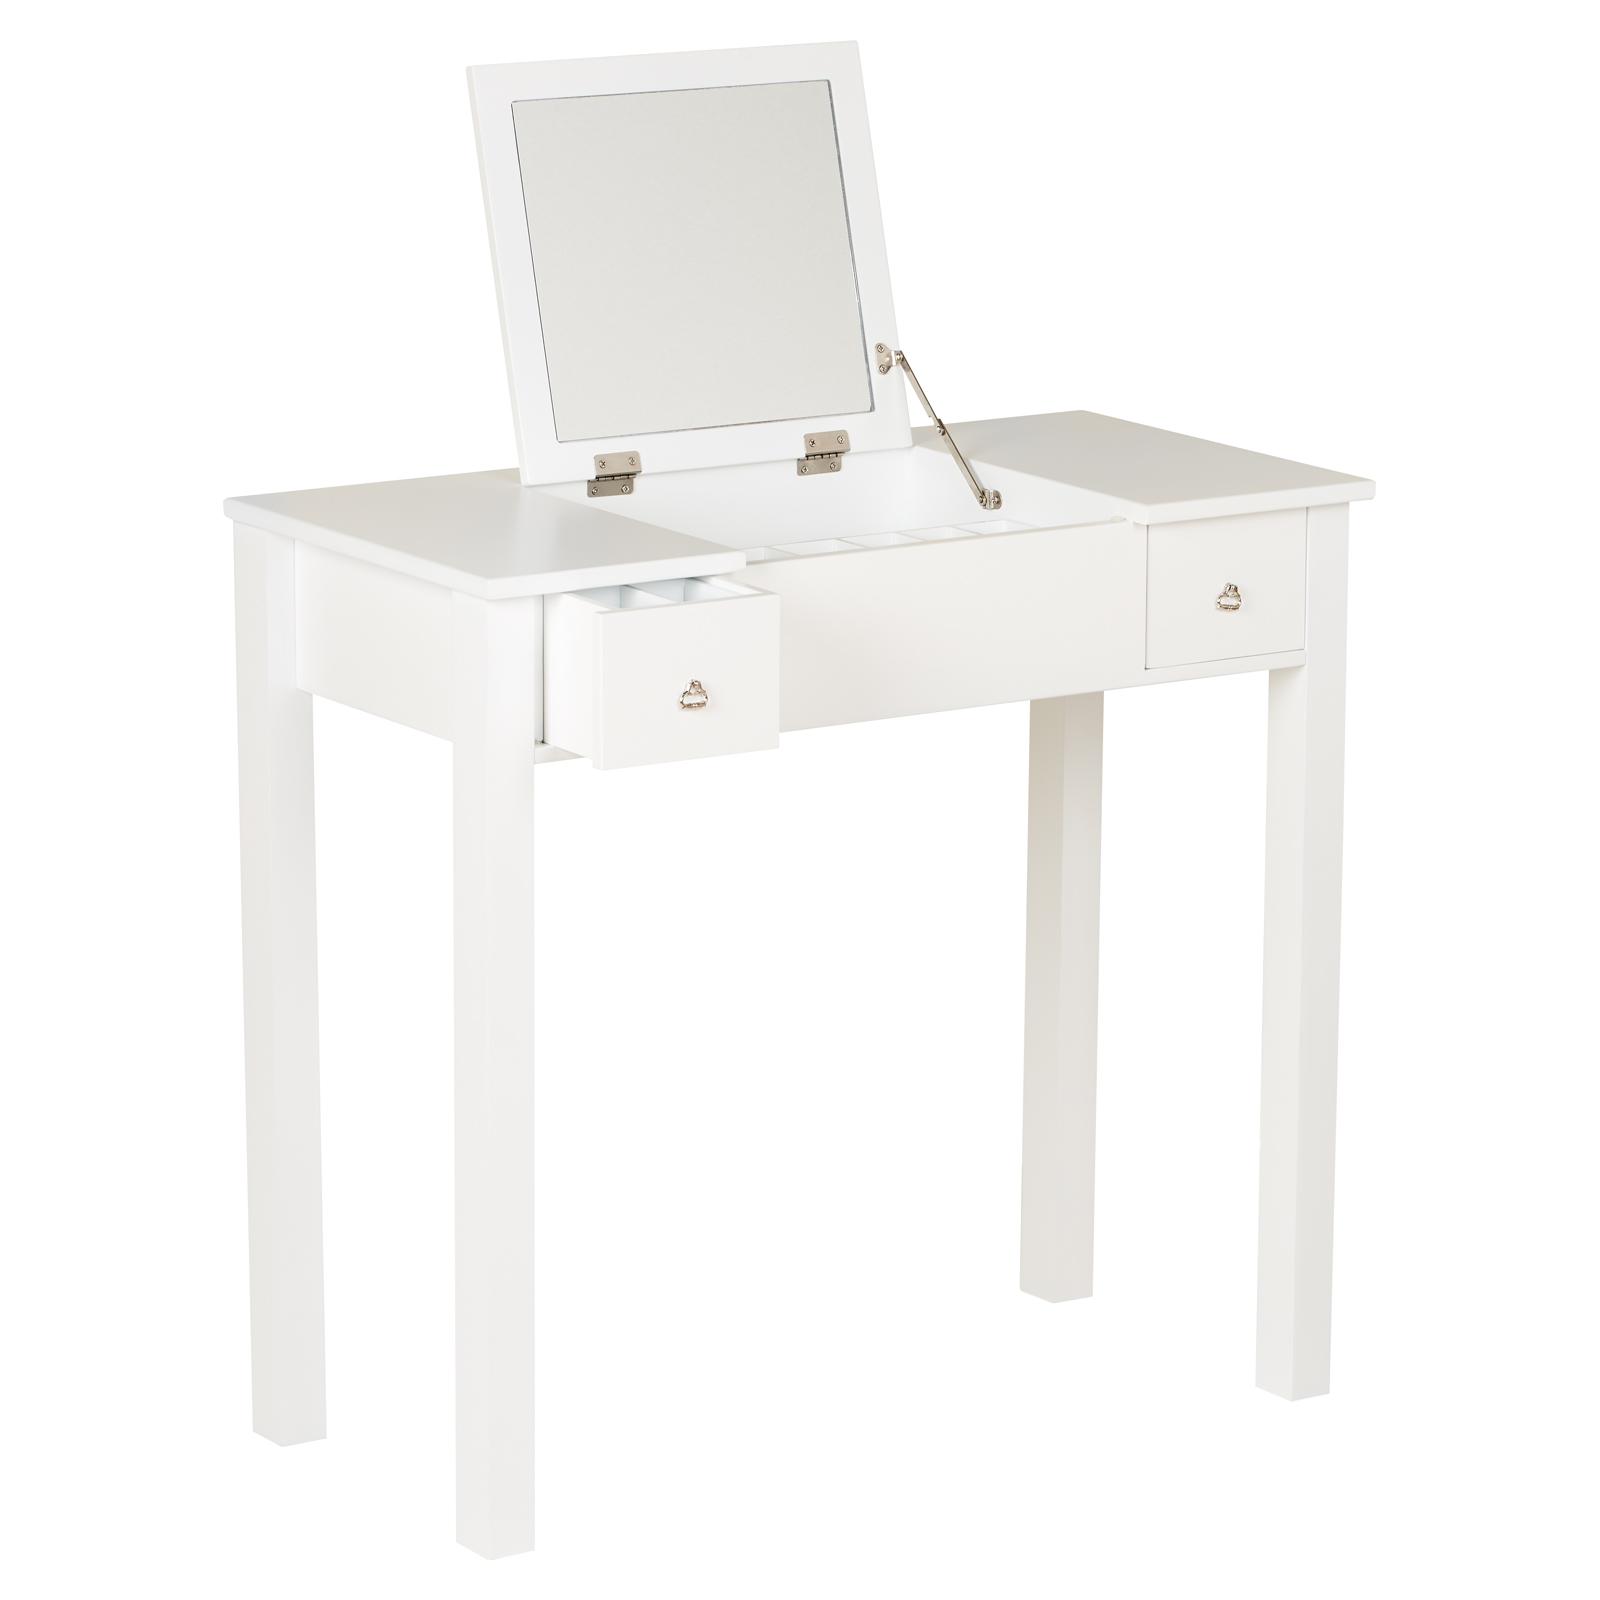 Outstanding White Makeup Table With Drawers Saubhaya Makeup Uwap Interior Chair Design Uwaporg